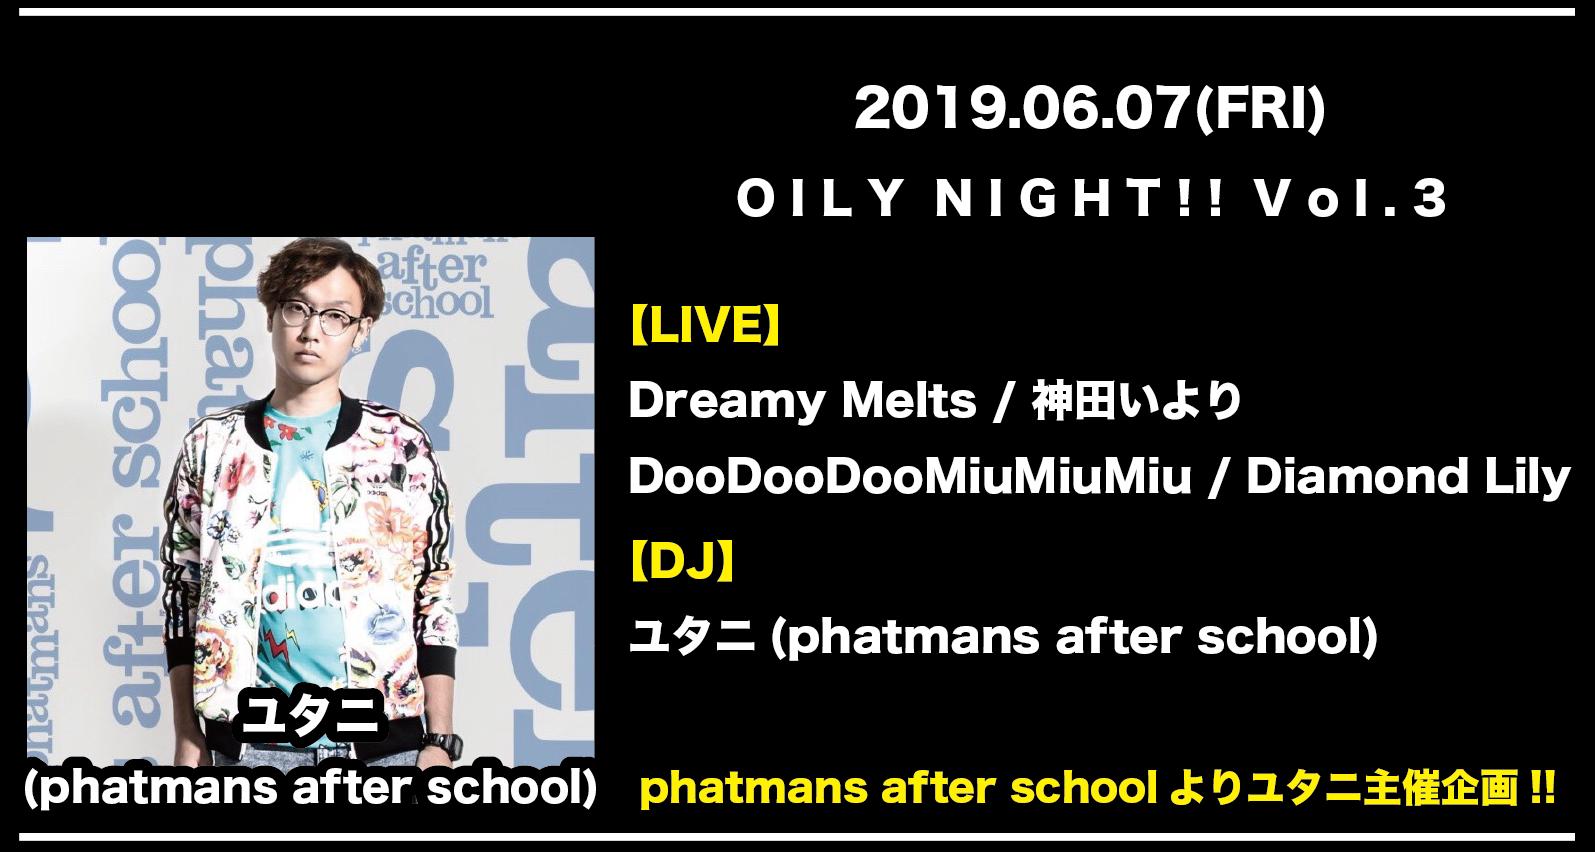 OILY NIGHT!! Vol.3